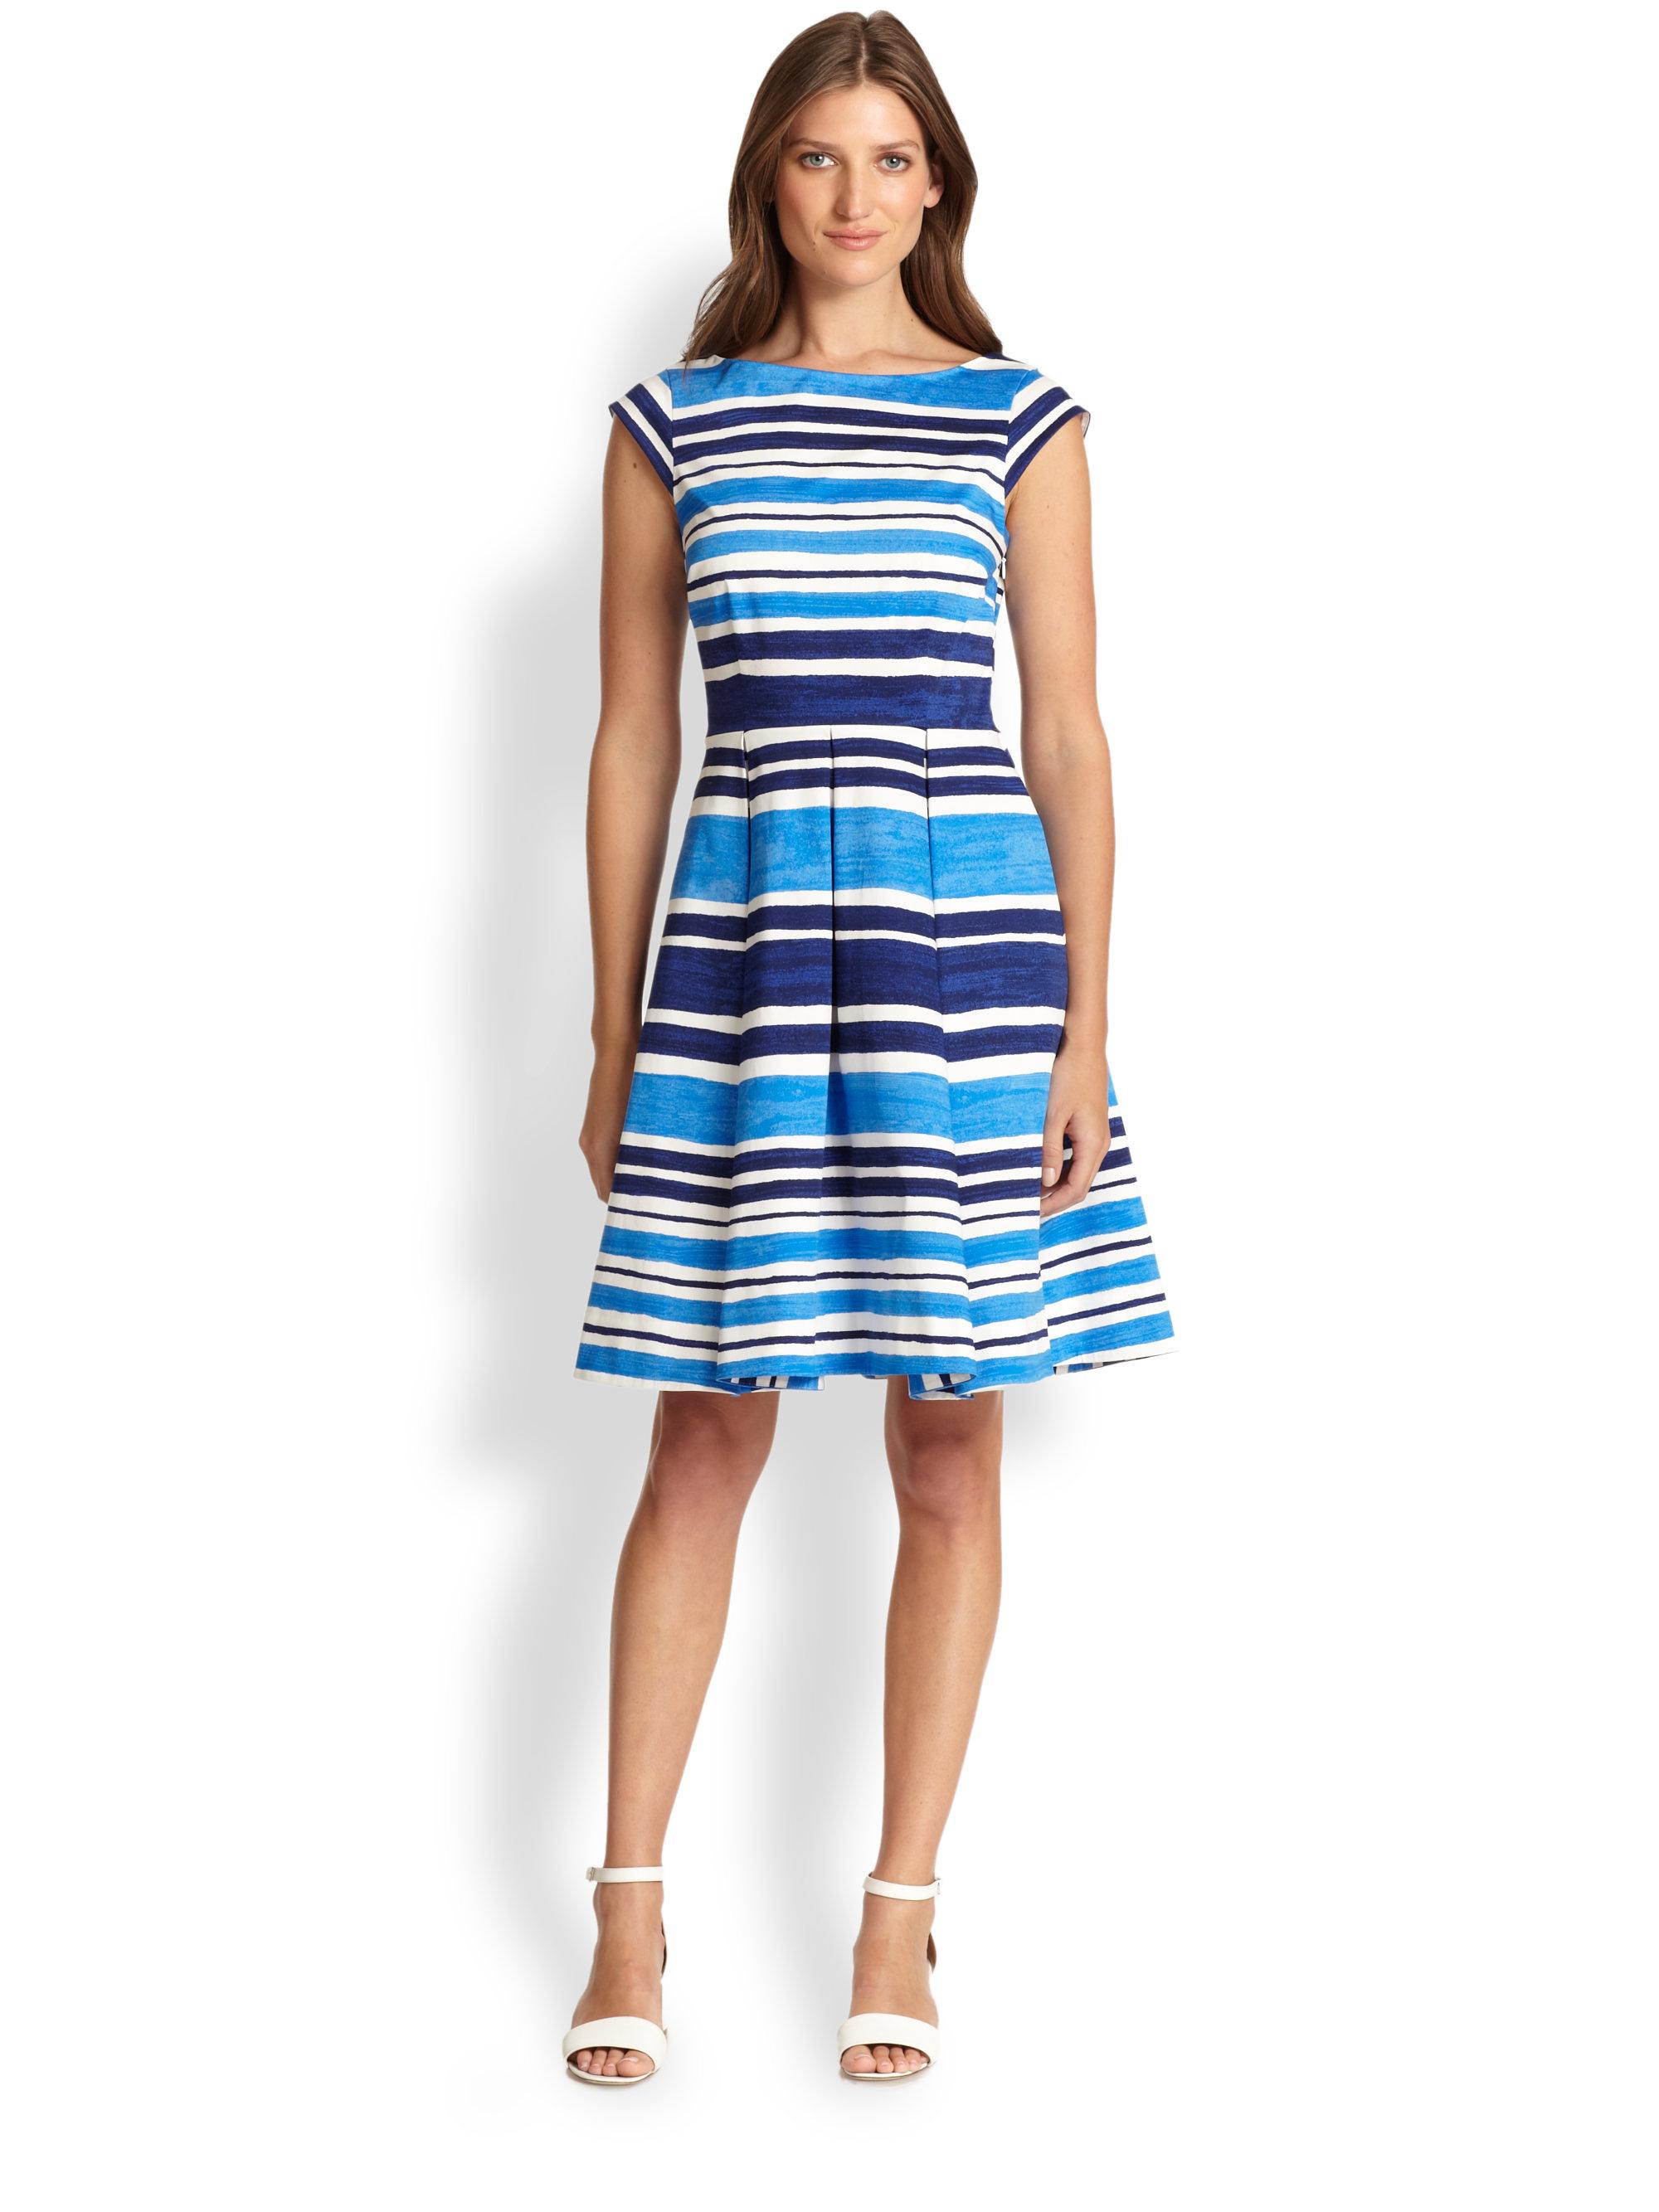 Lyst Kate Spade New York Mariella Dress In Blue